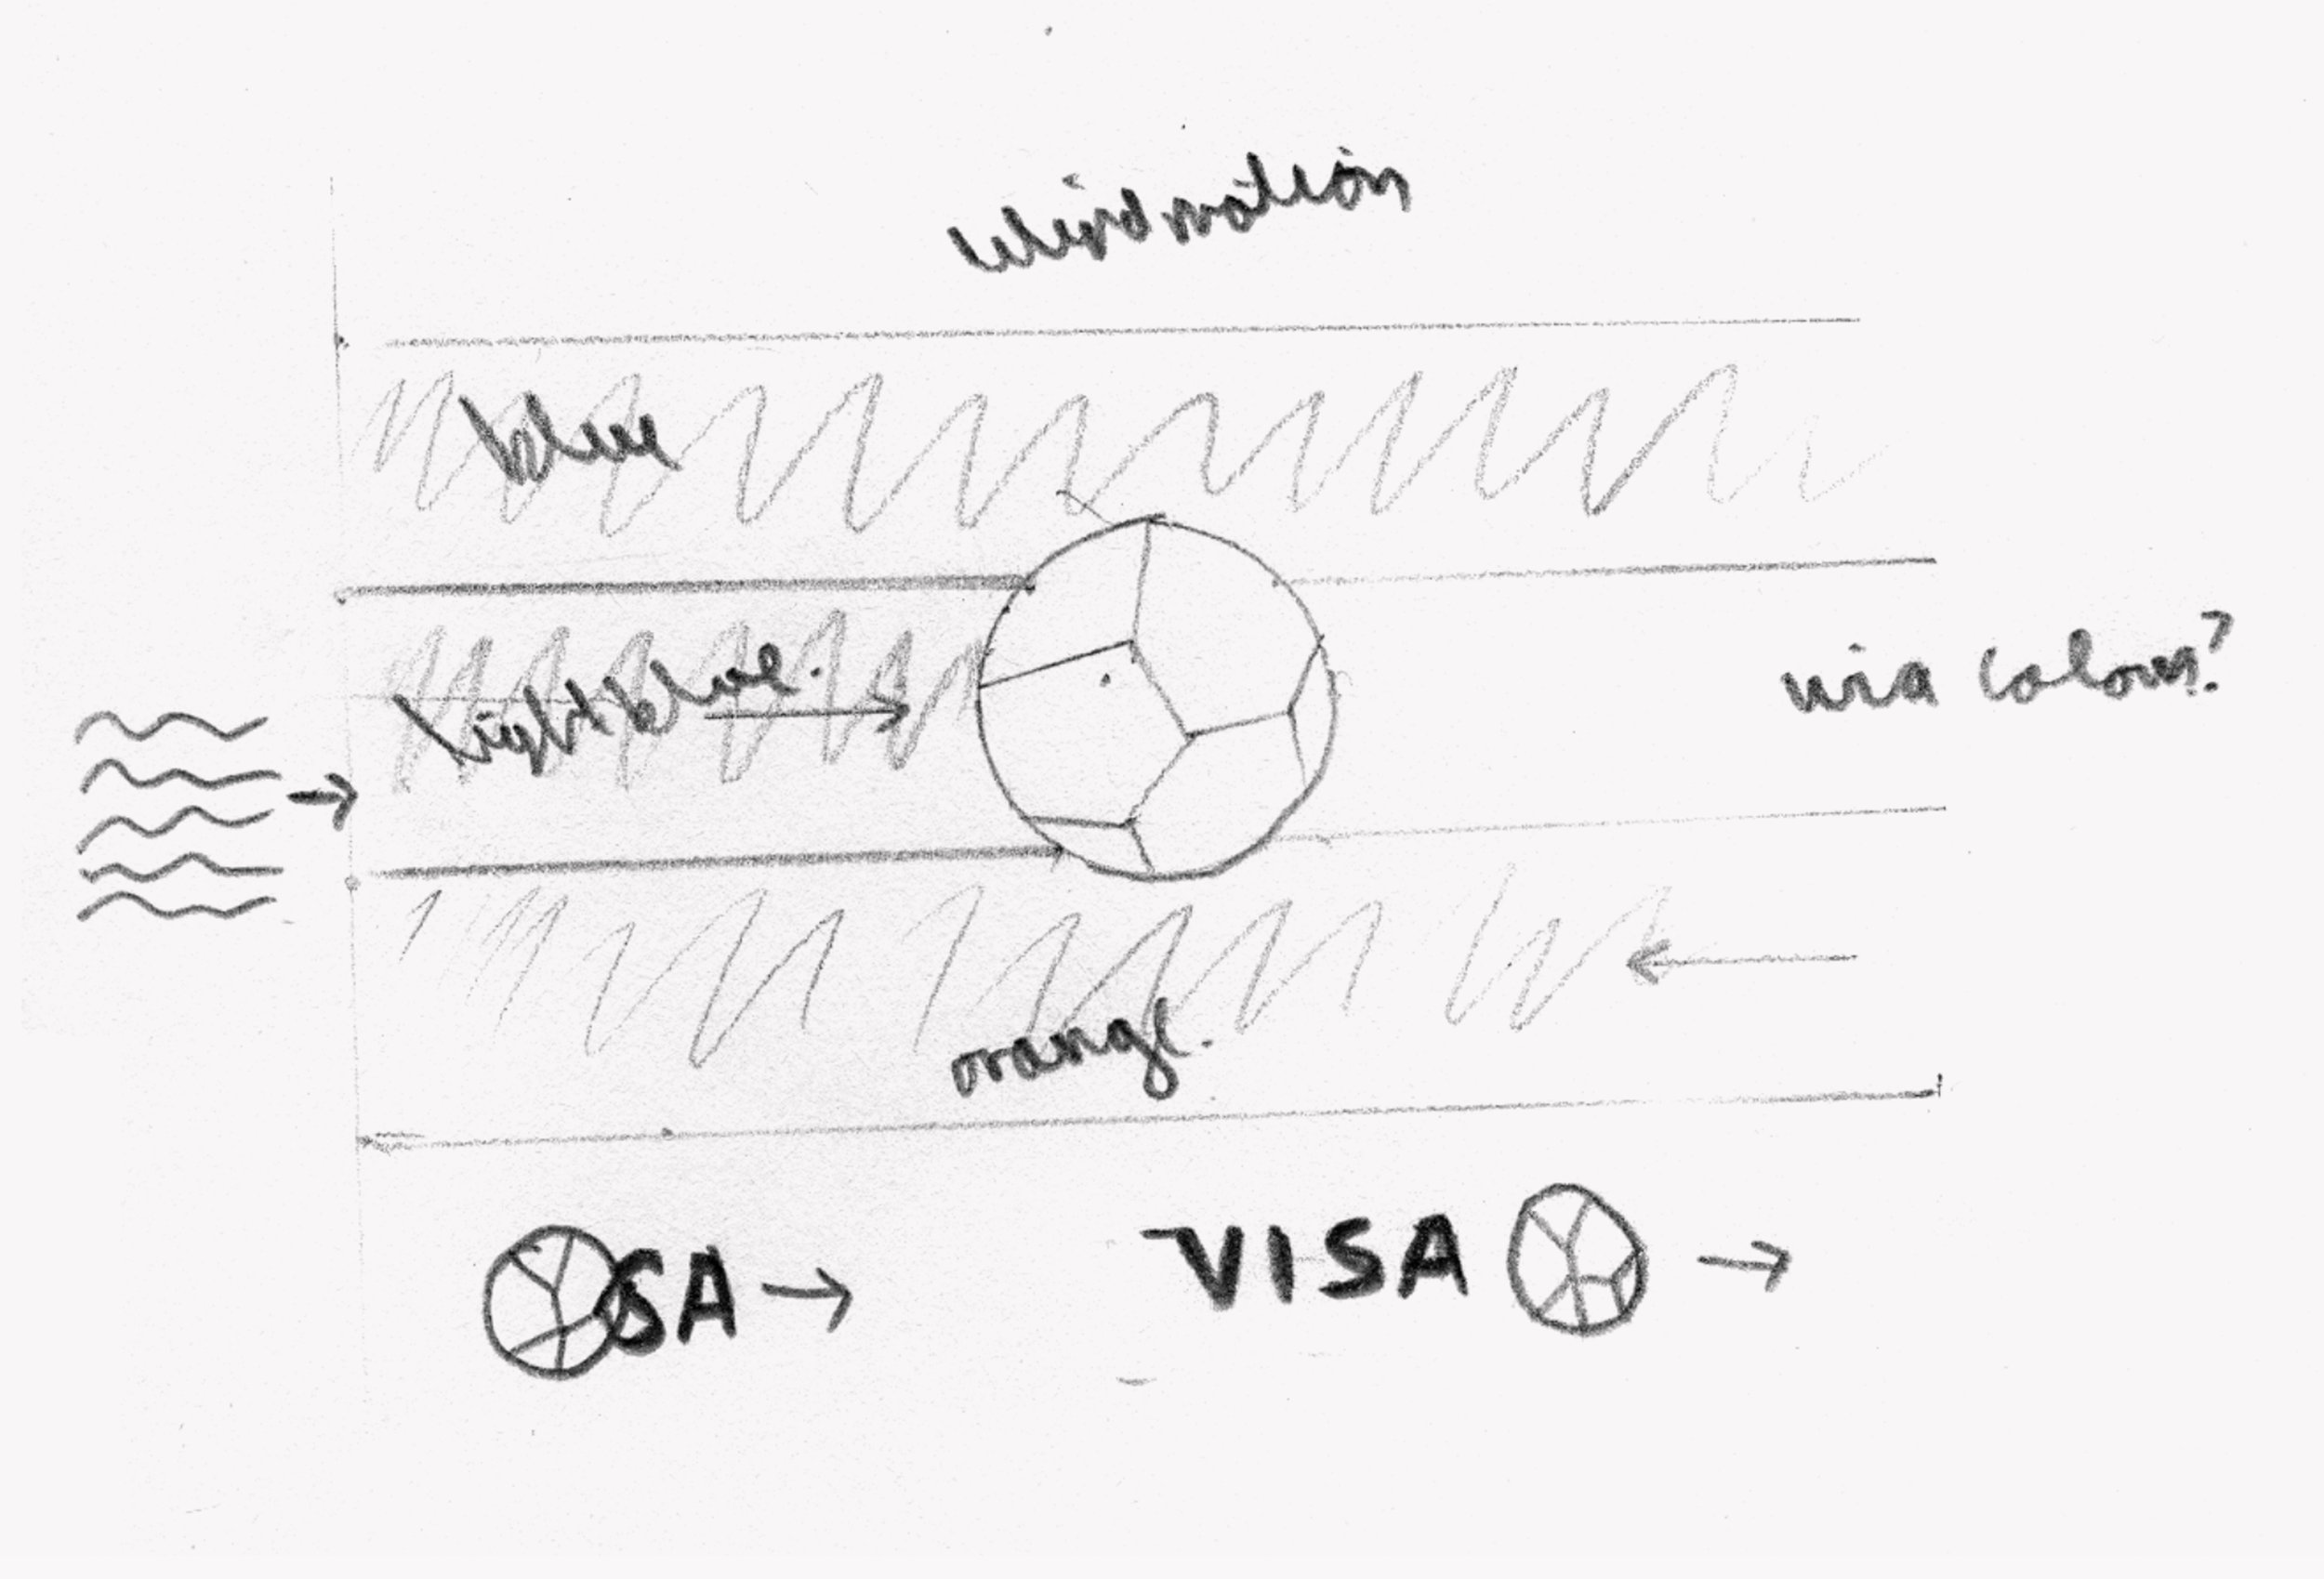 IDEAS_WITH_FORM_VISA_FOOTBALL_SKETCH.jpg